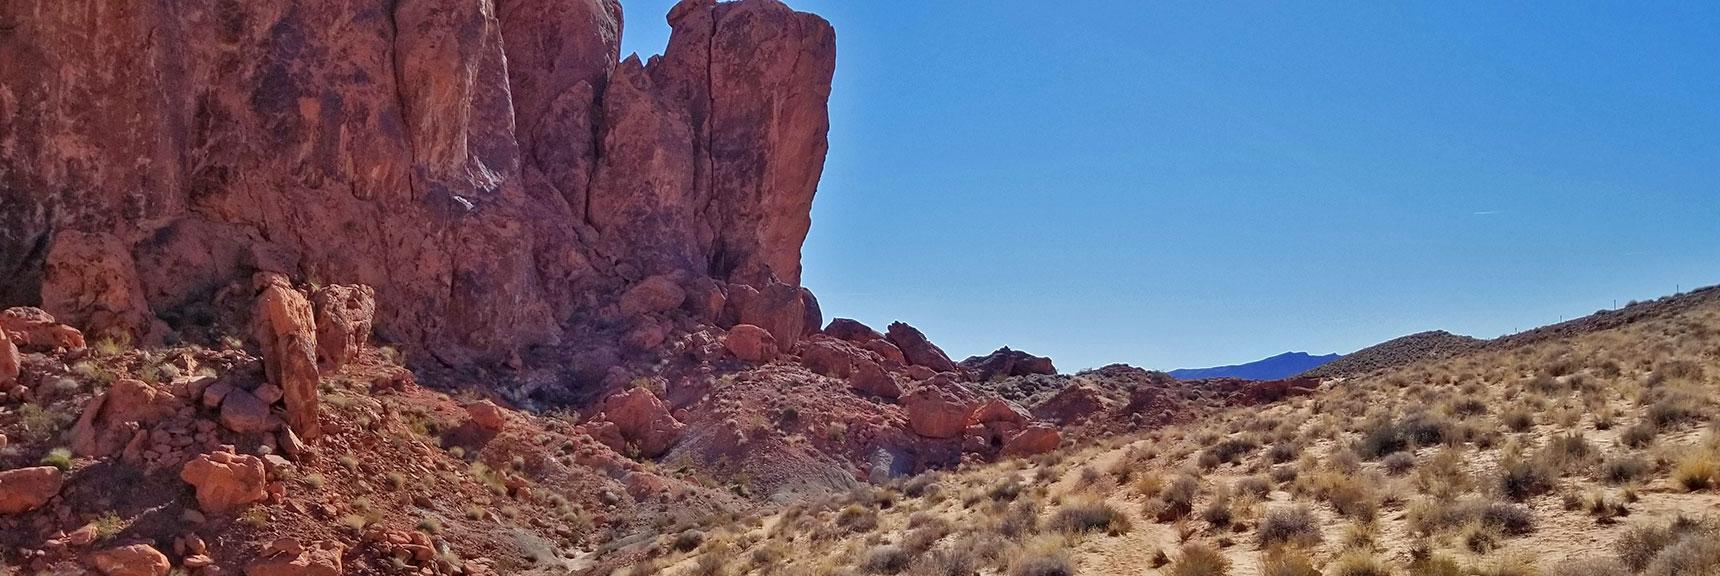 Firewave in Valley of Fire State Park, Nevada, Slide 002